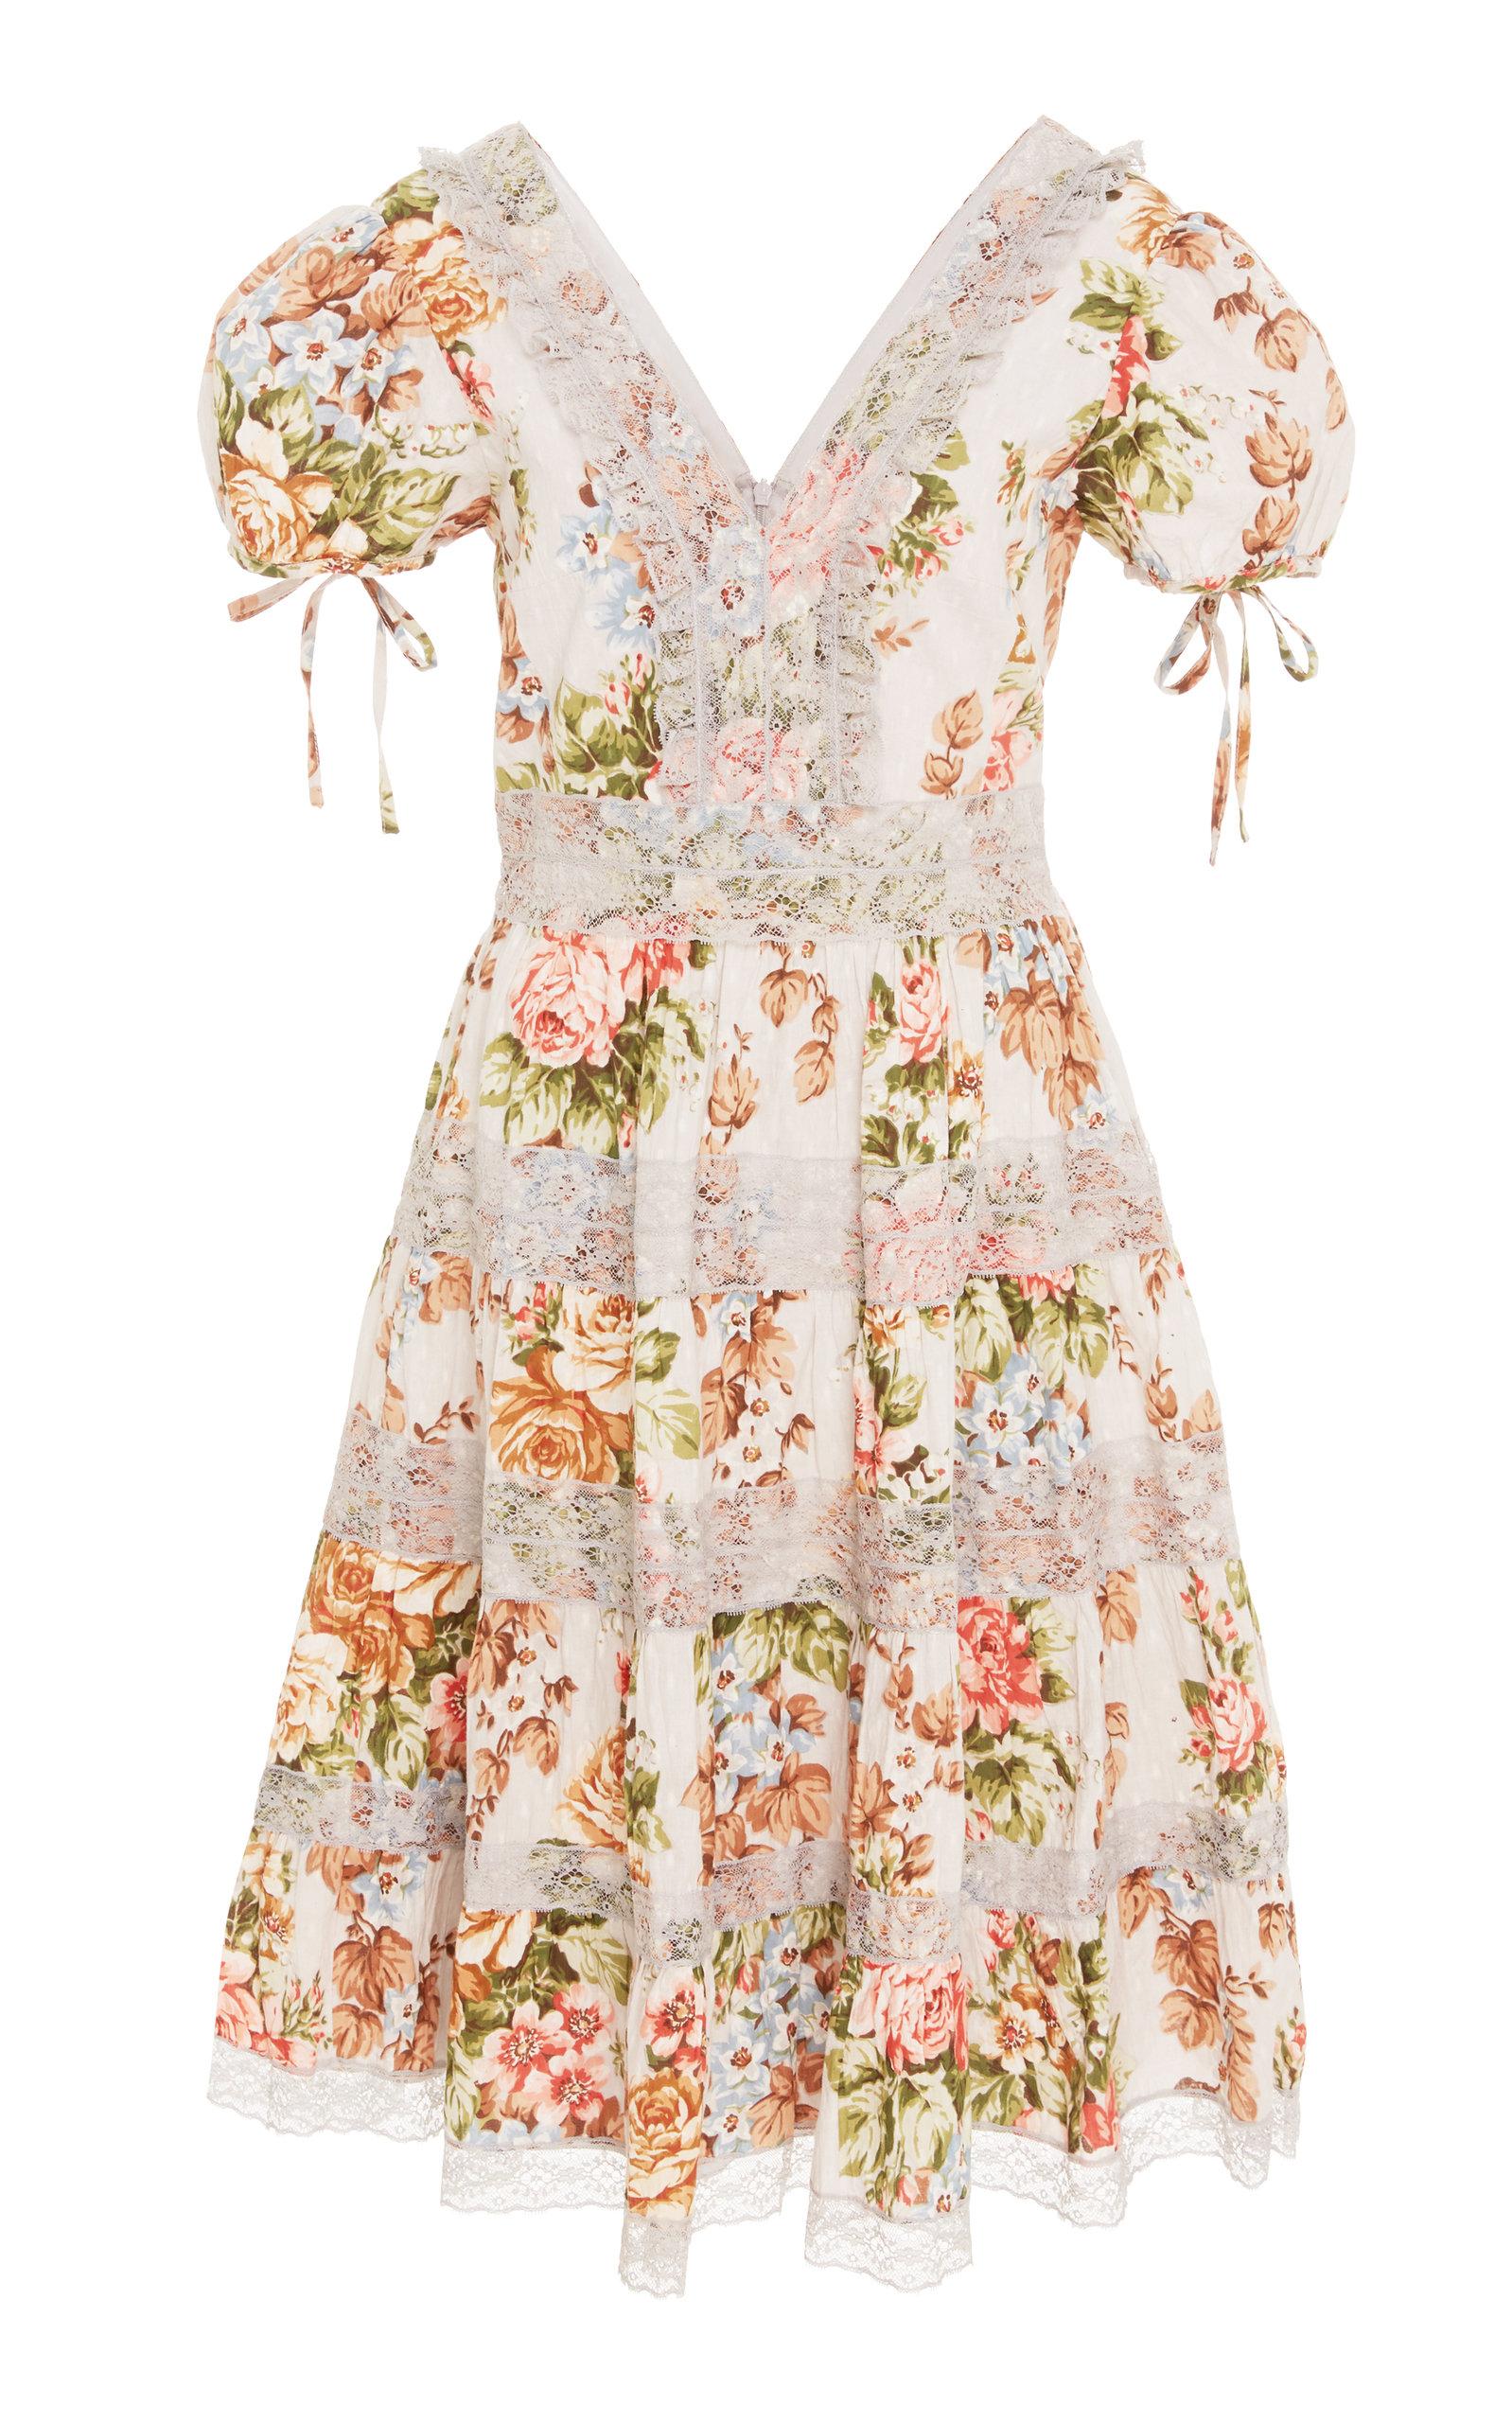 Paradise Rose Cotton and Lace Dress Needle & Thread xXhHQEj